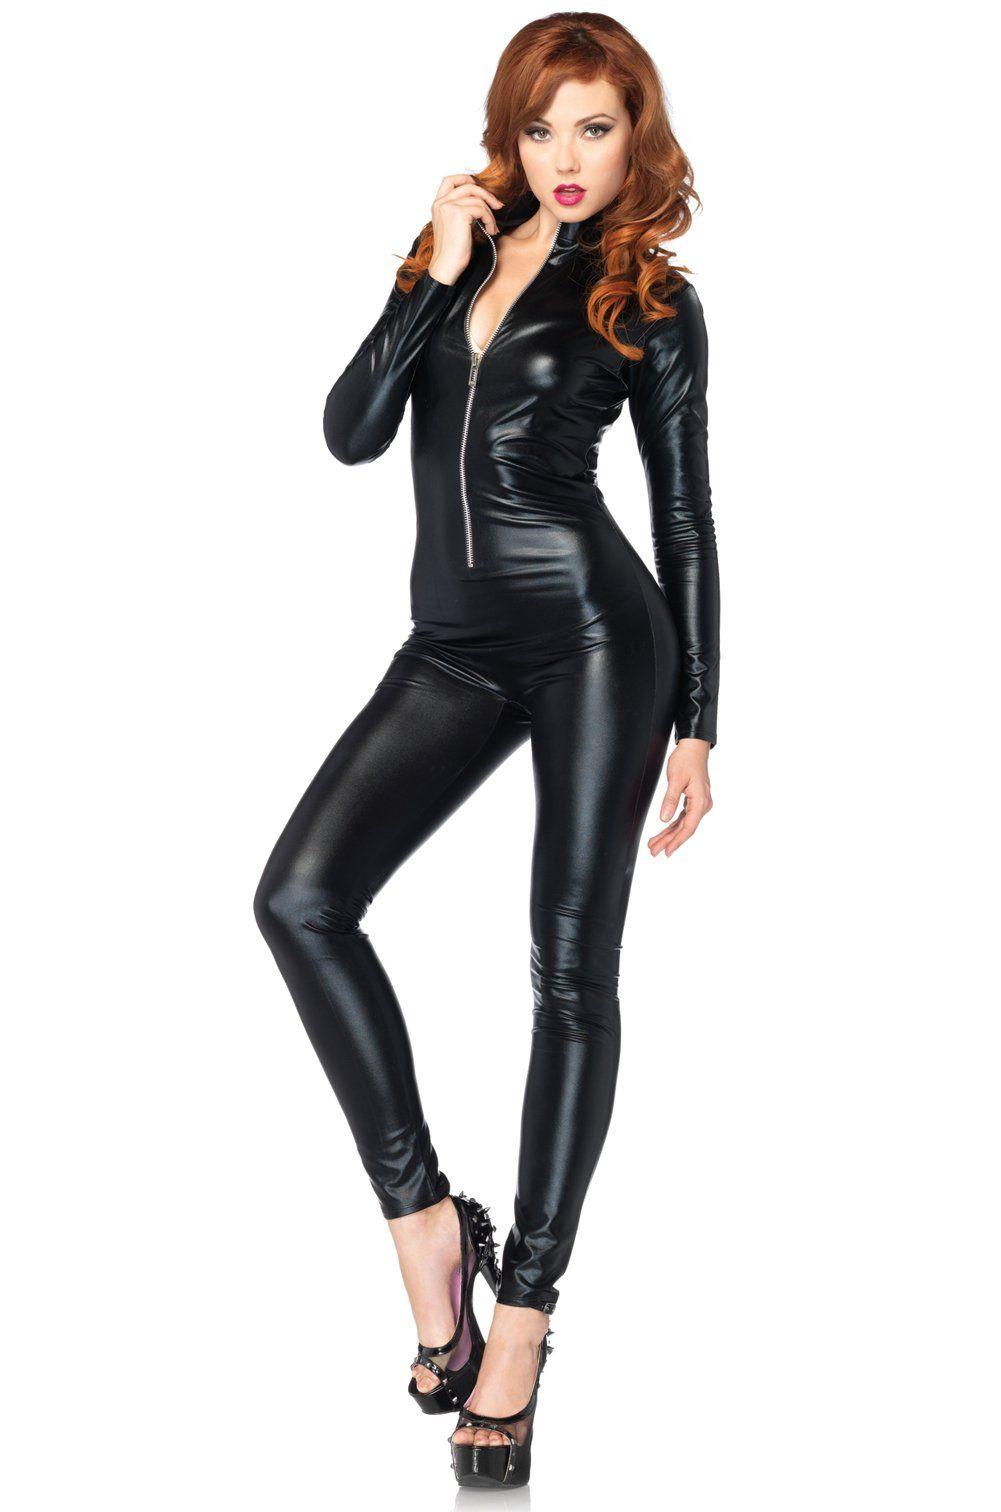 5ffae917ab5 For Austin Powers Costume - Womens Black Wet Look Faux Leather Cat Body  Suit Jumpsuit Halloween Costume